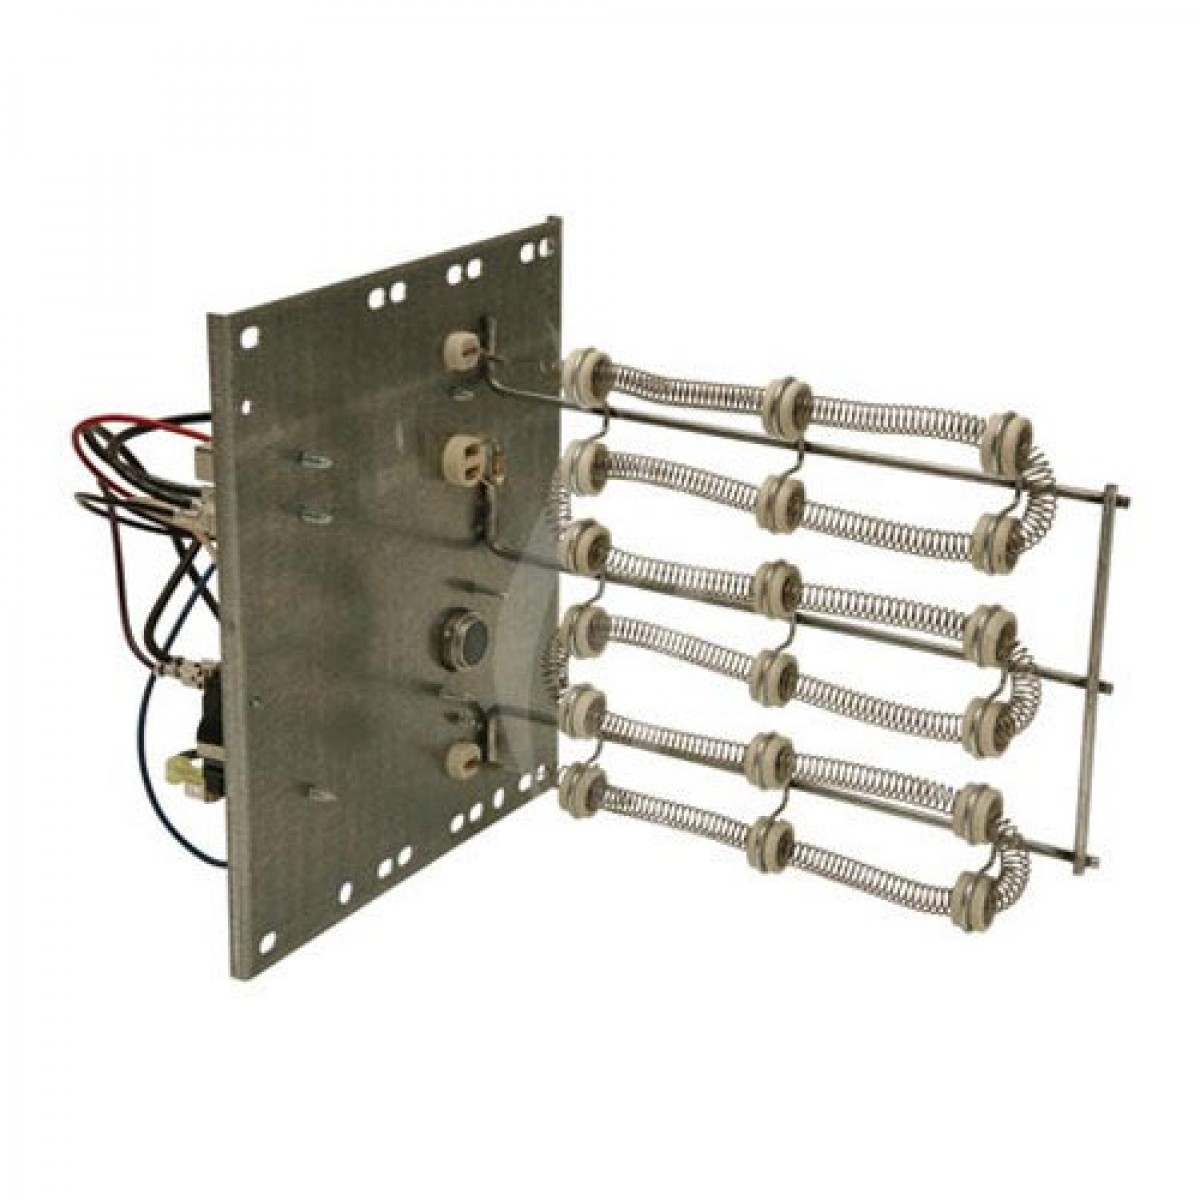 Peachy 15 Kw Rheem Rxbh Electric Strip Heater With Circuit Breaker Wiring Cloud Waroletkolfr09Org